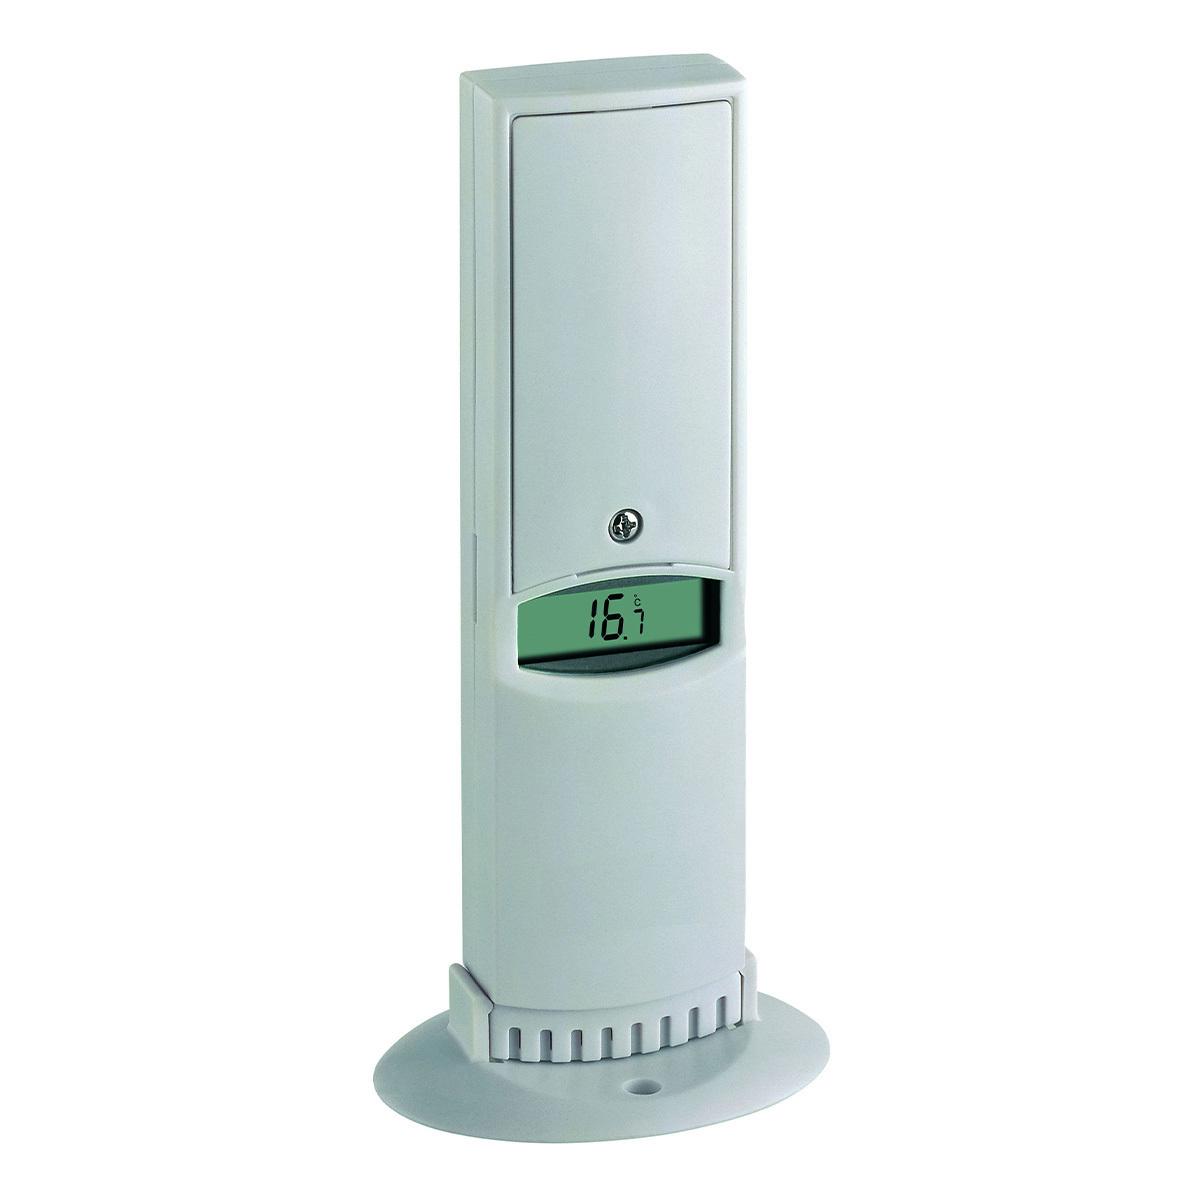 30-3013-it-funk-thermo-hygrometer-maxim-2-sender-1200x1200px.jpg